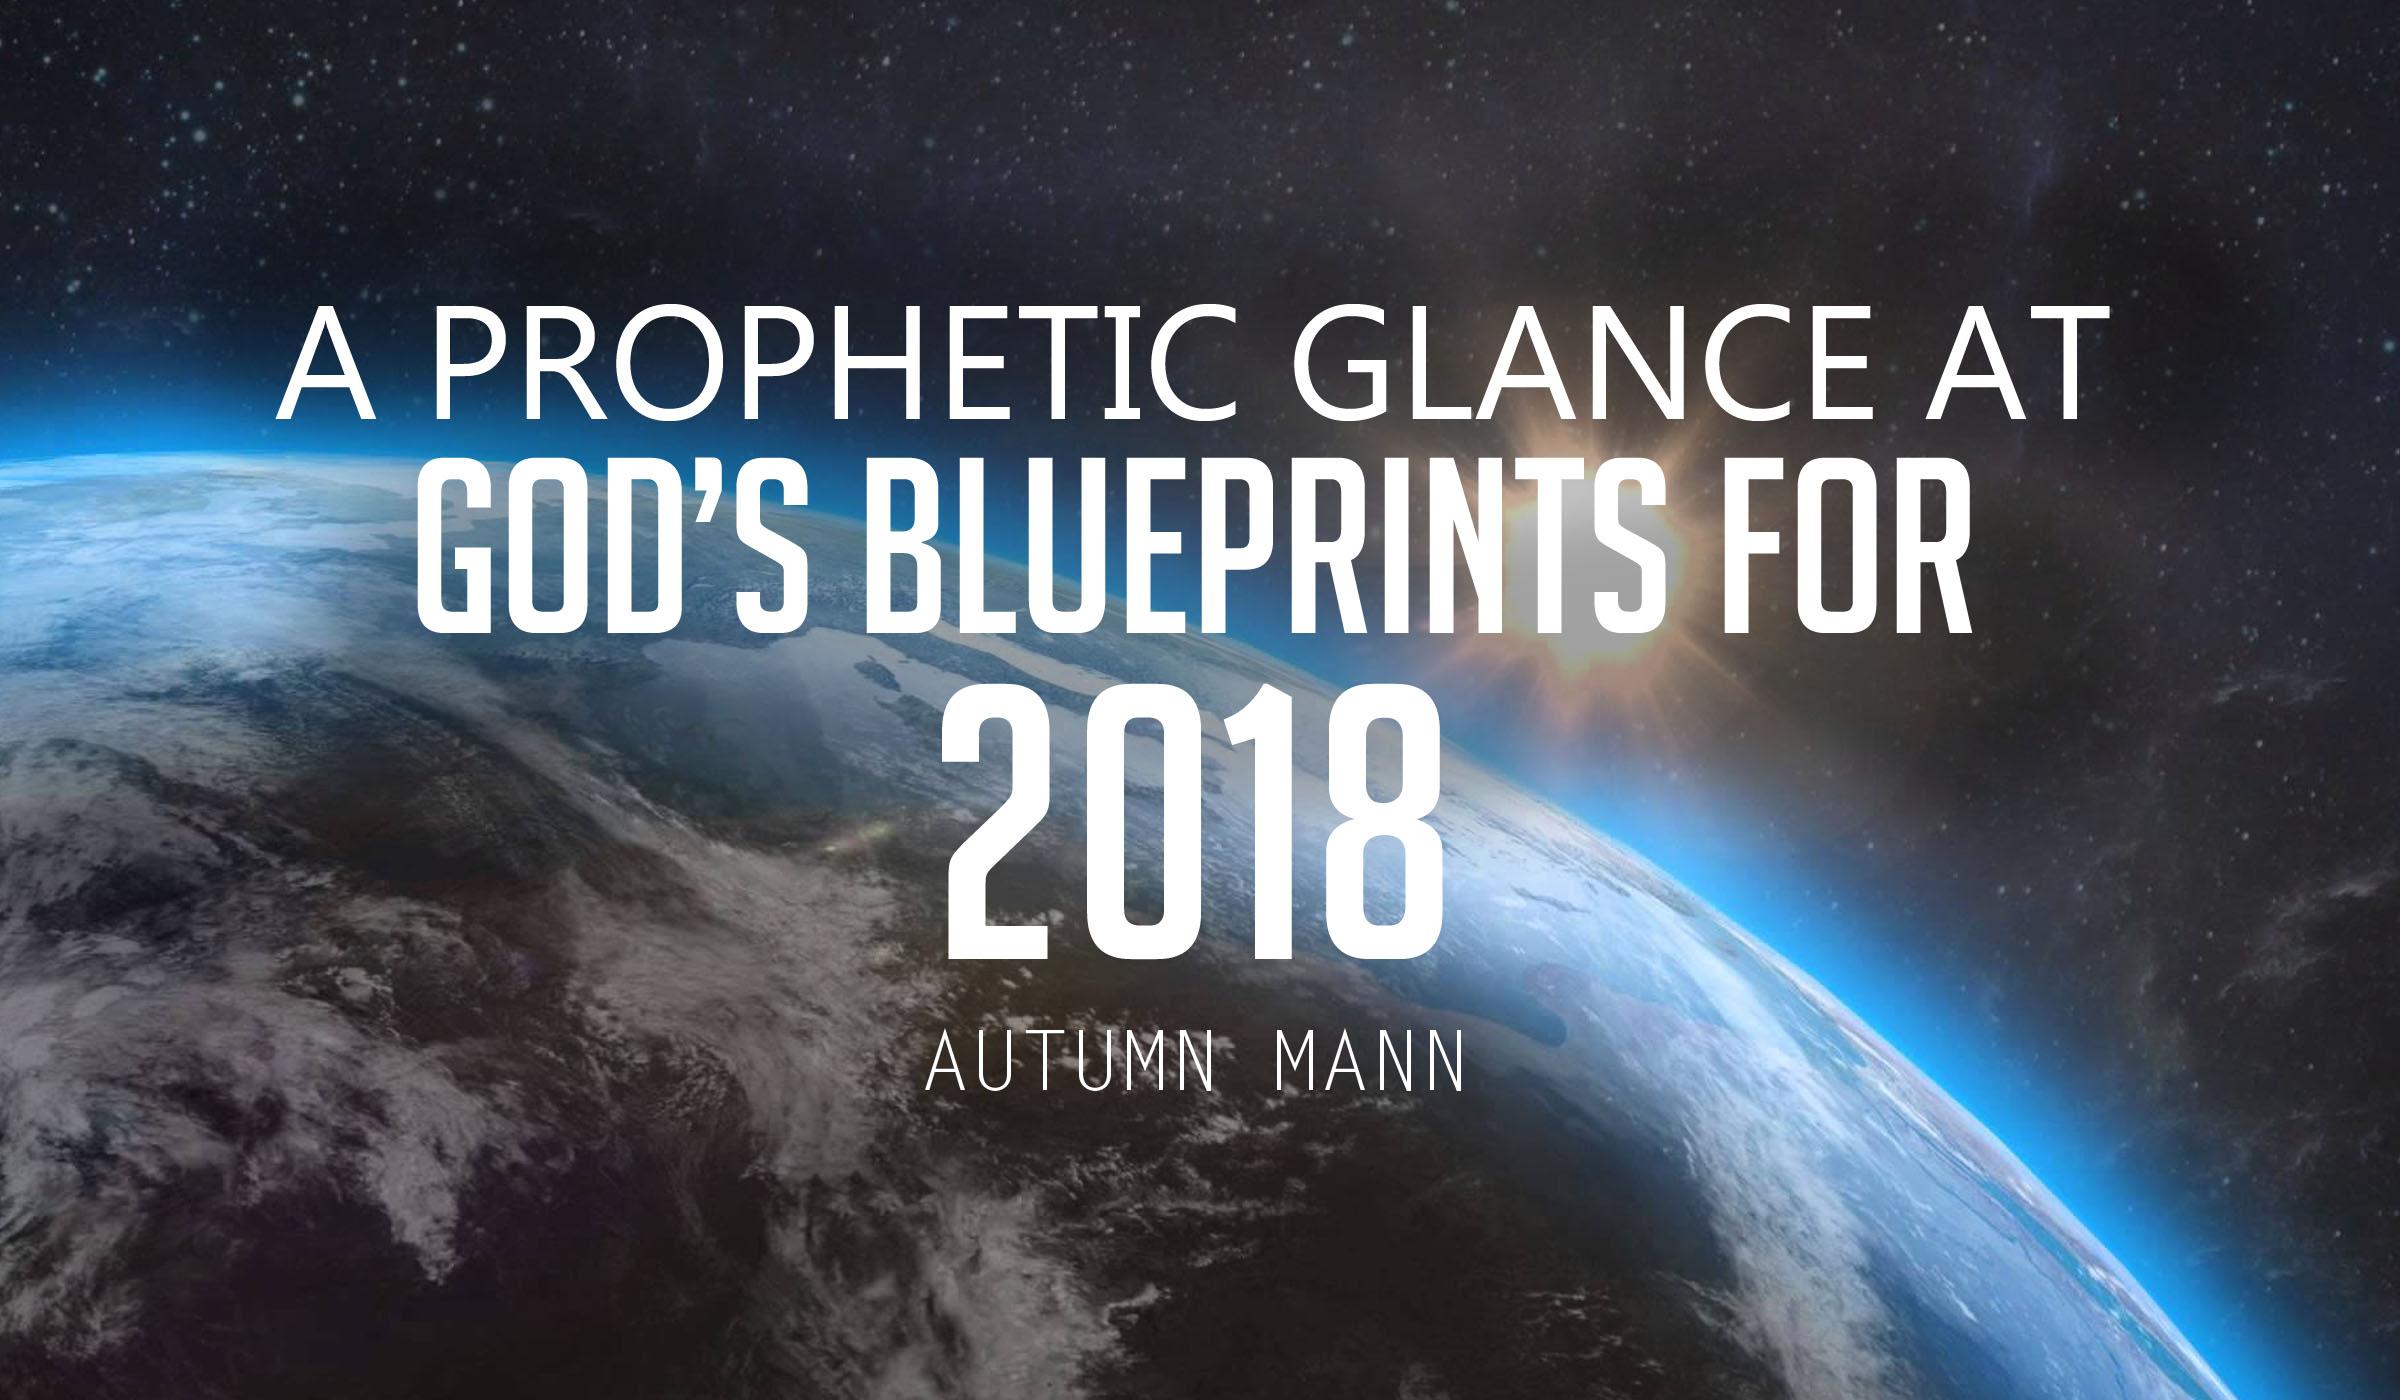 A Prophetic Glance at God's Blueprints for 2018